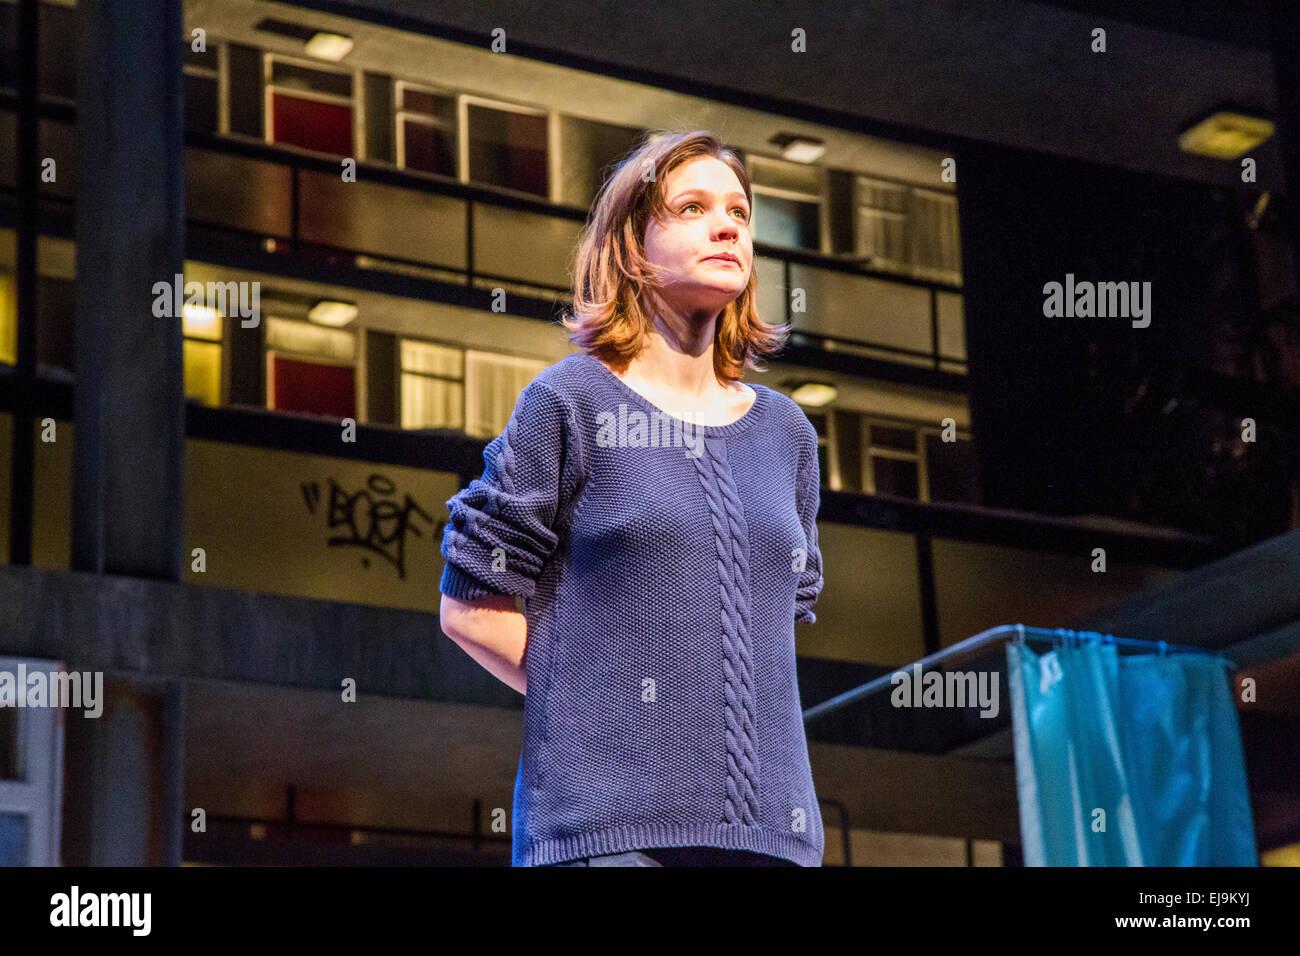 Carey Mulligan in der Stephendaldrys Produktion von David Hares Skylight, New York 2015. Stockbild